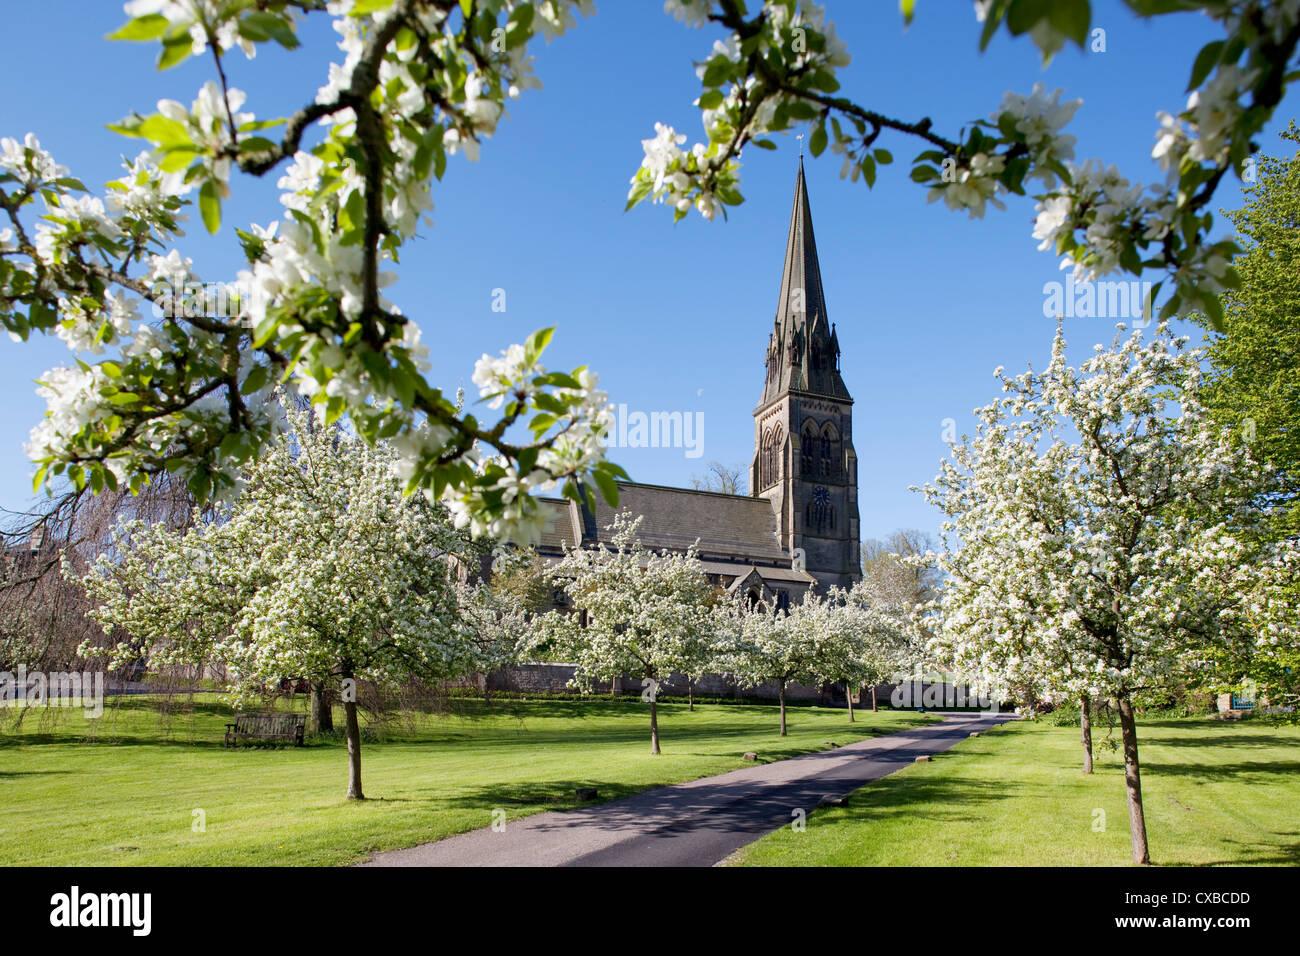 Edensor Village, Chatsworth Estate, Derbyshire, England, United Kingdom, Europe - Stock Image